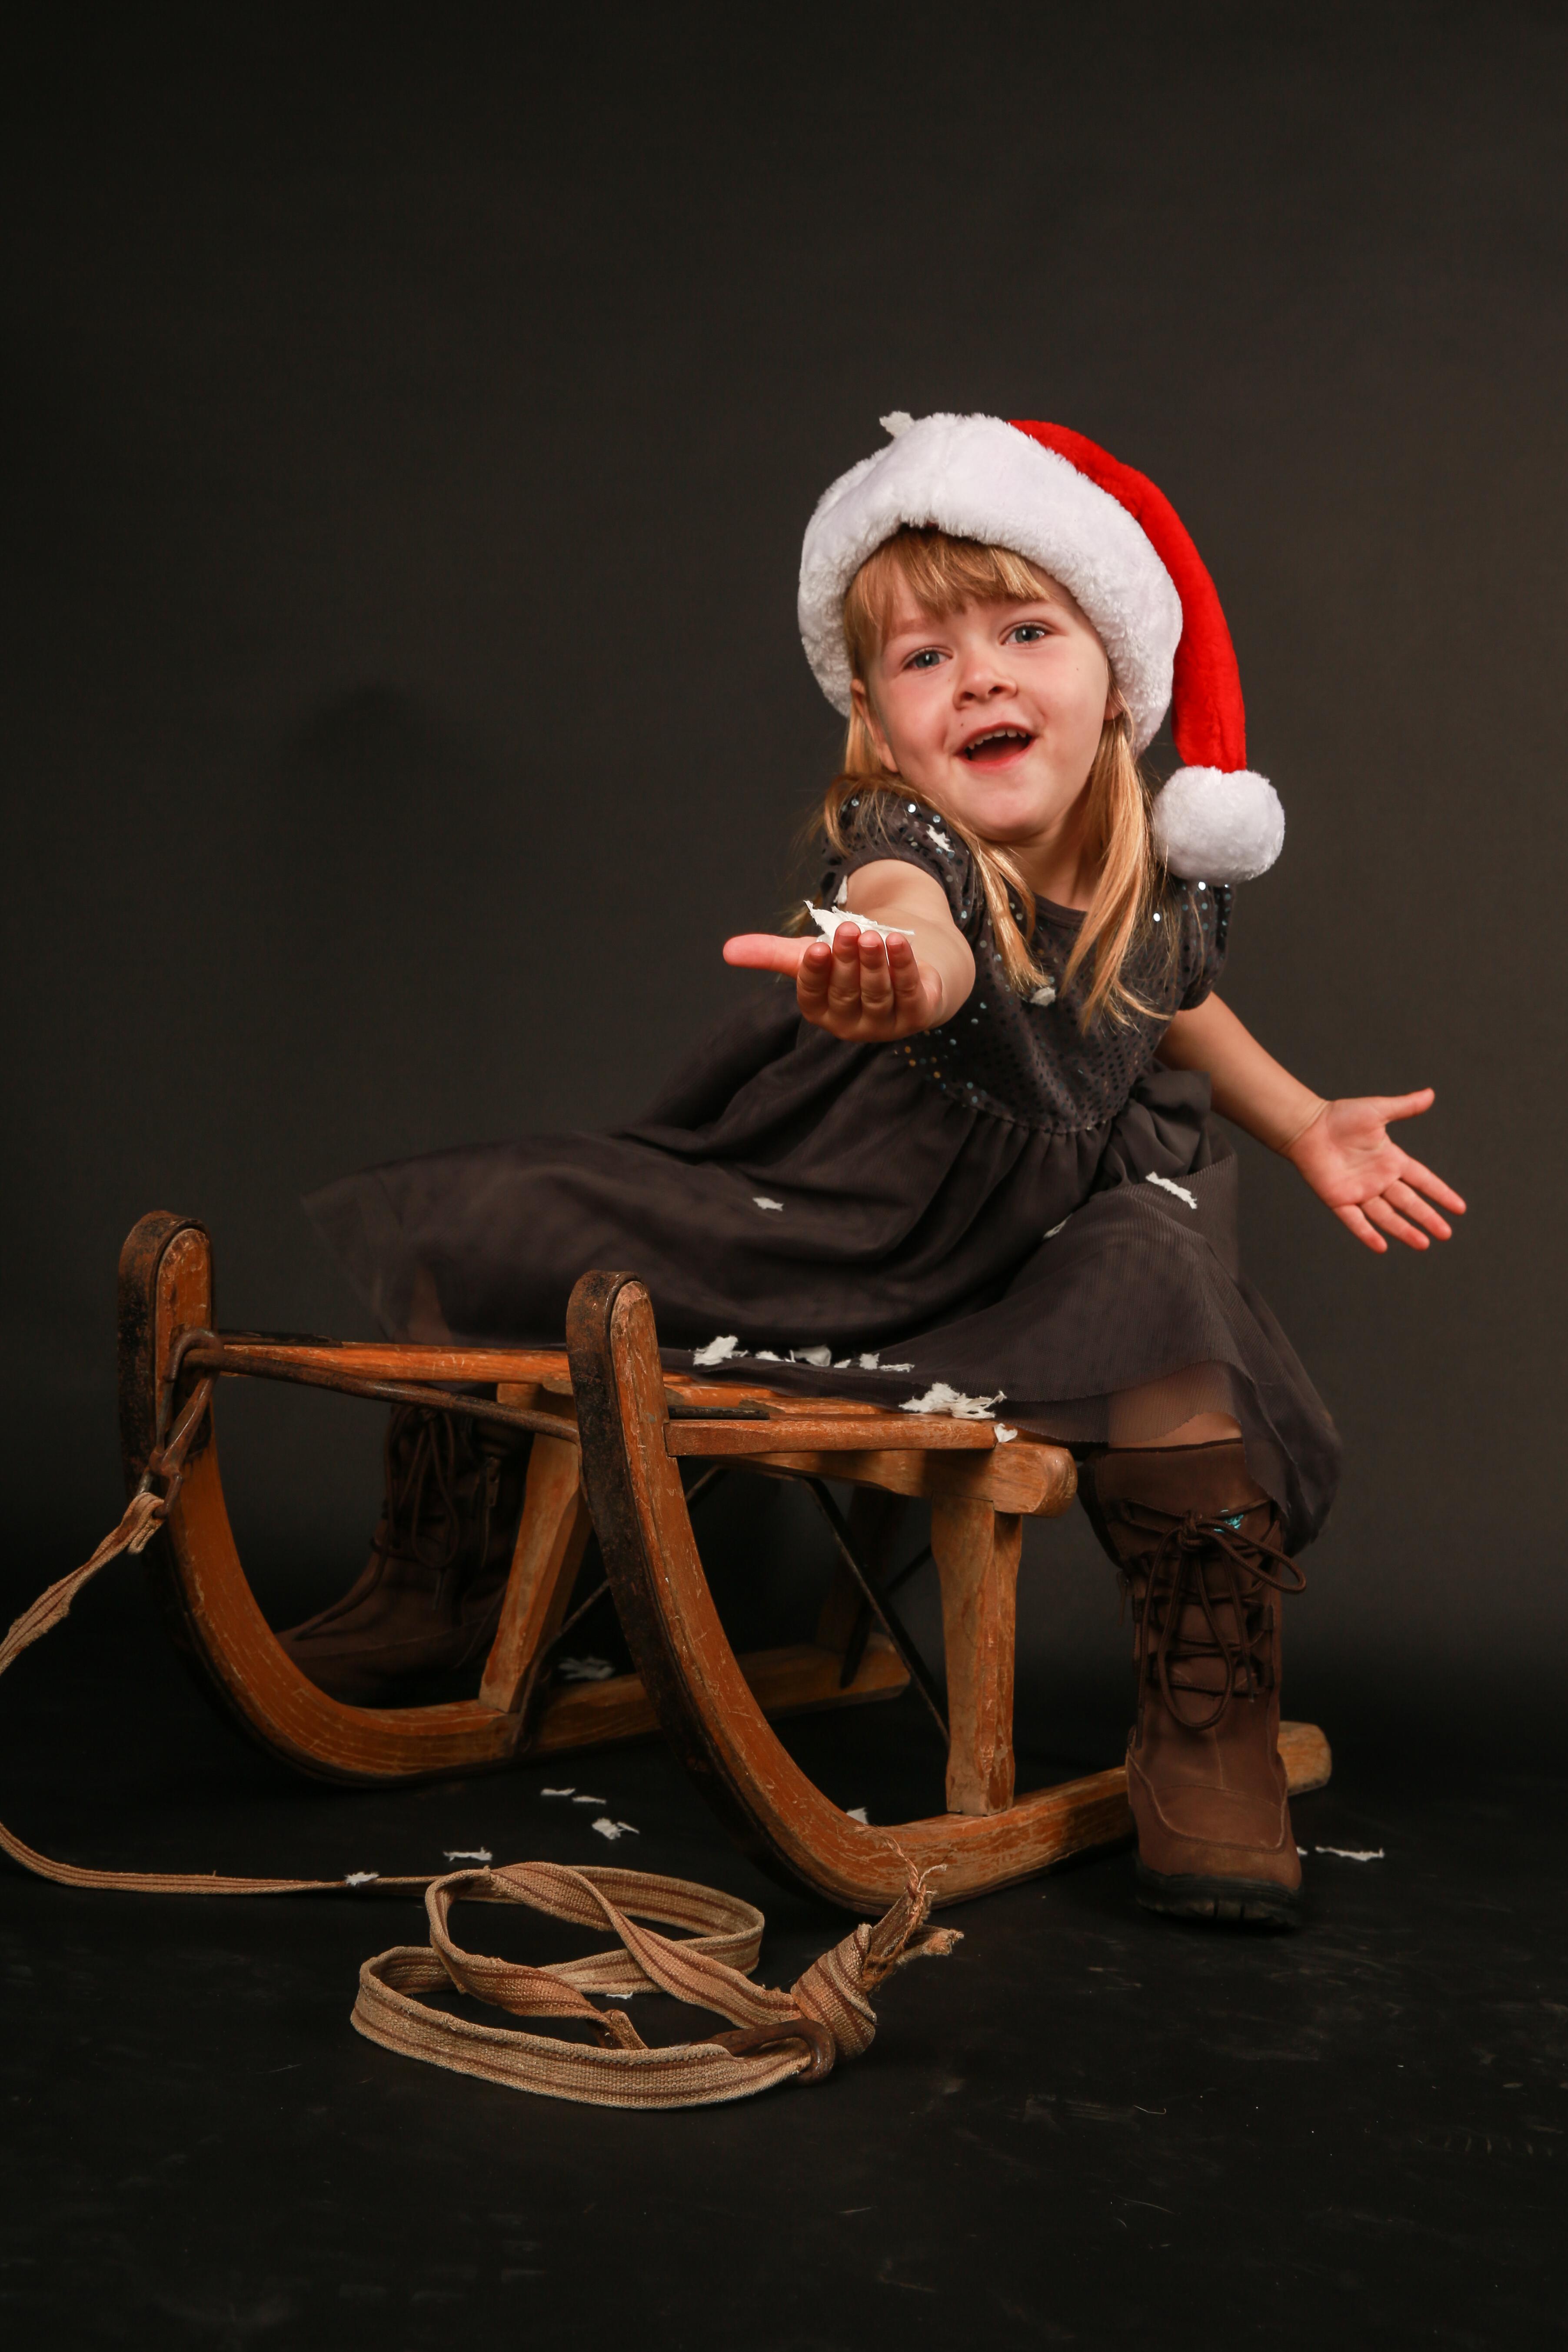 FOTIFABRIK.ch Beitrag: Kinder Weihnachts-Fotoshootings